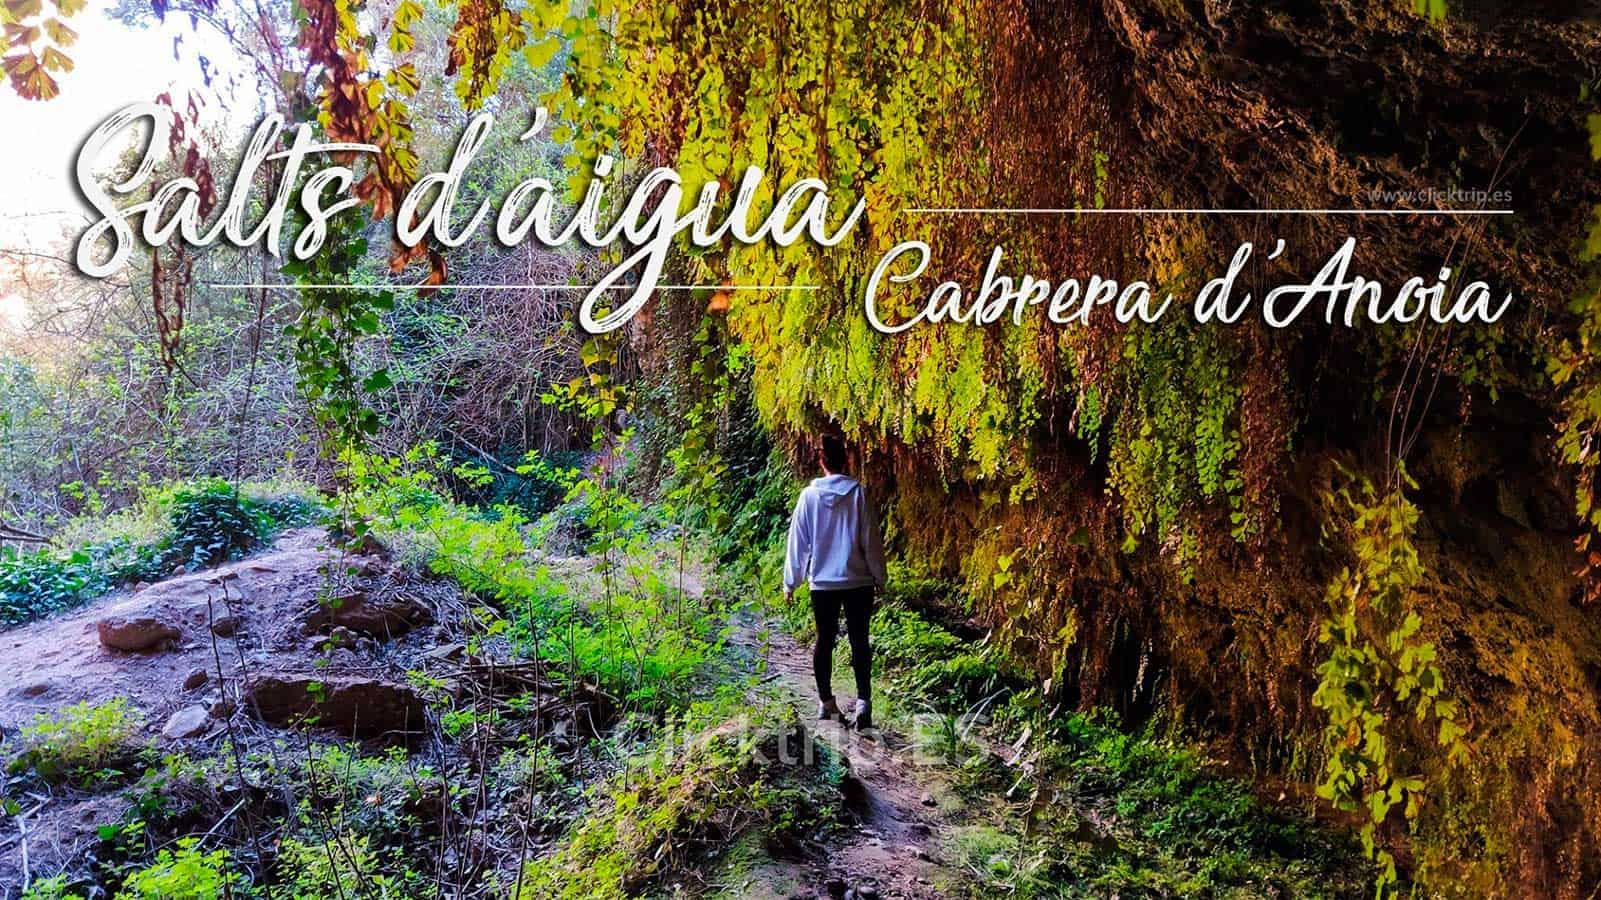 Salts-Aigua-Cabrera-Anoia-Gorgs-Catalunya-Excursión-Ruta-Senderismo_ClickTrip